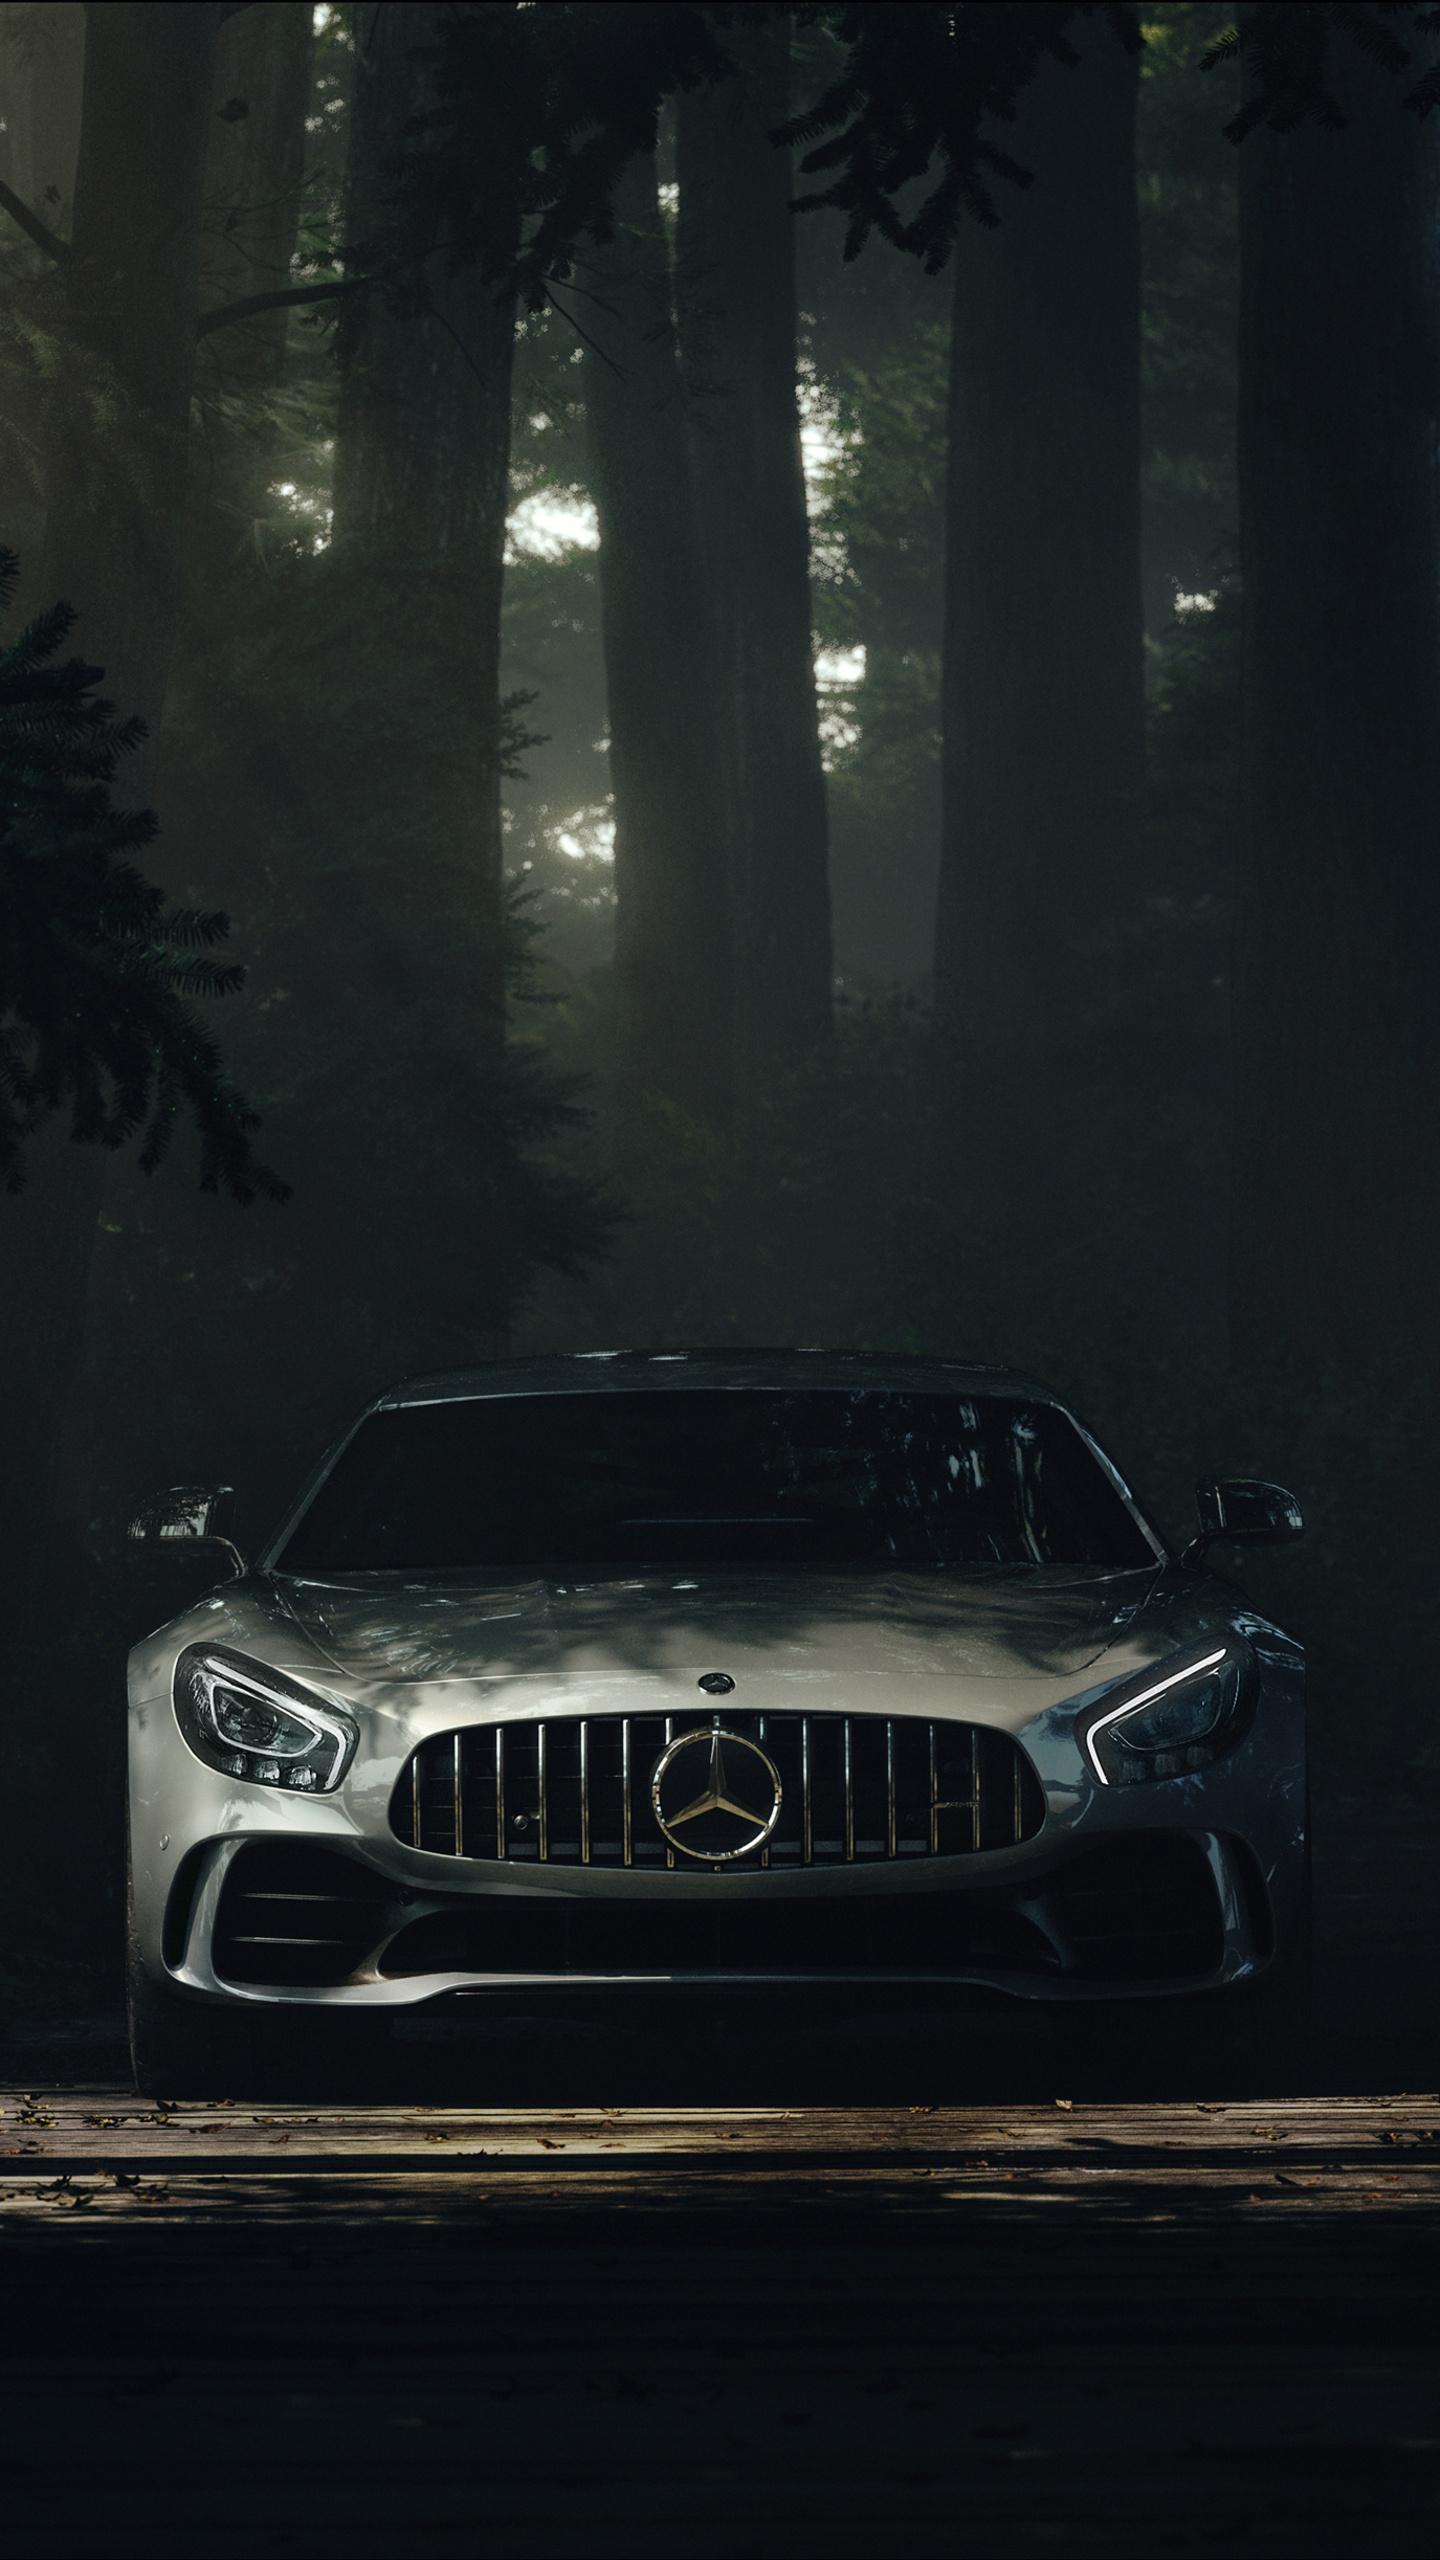 1440x2560 Mercedes Benz Amg GT Forest Samsung Galaxy S6,S7 ...